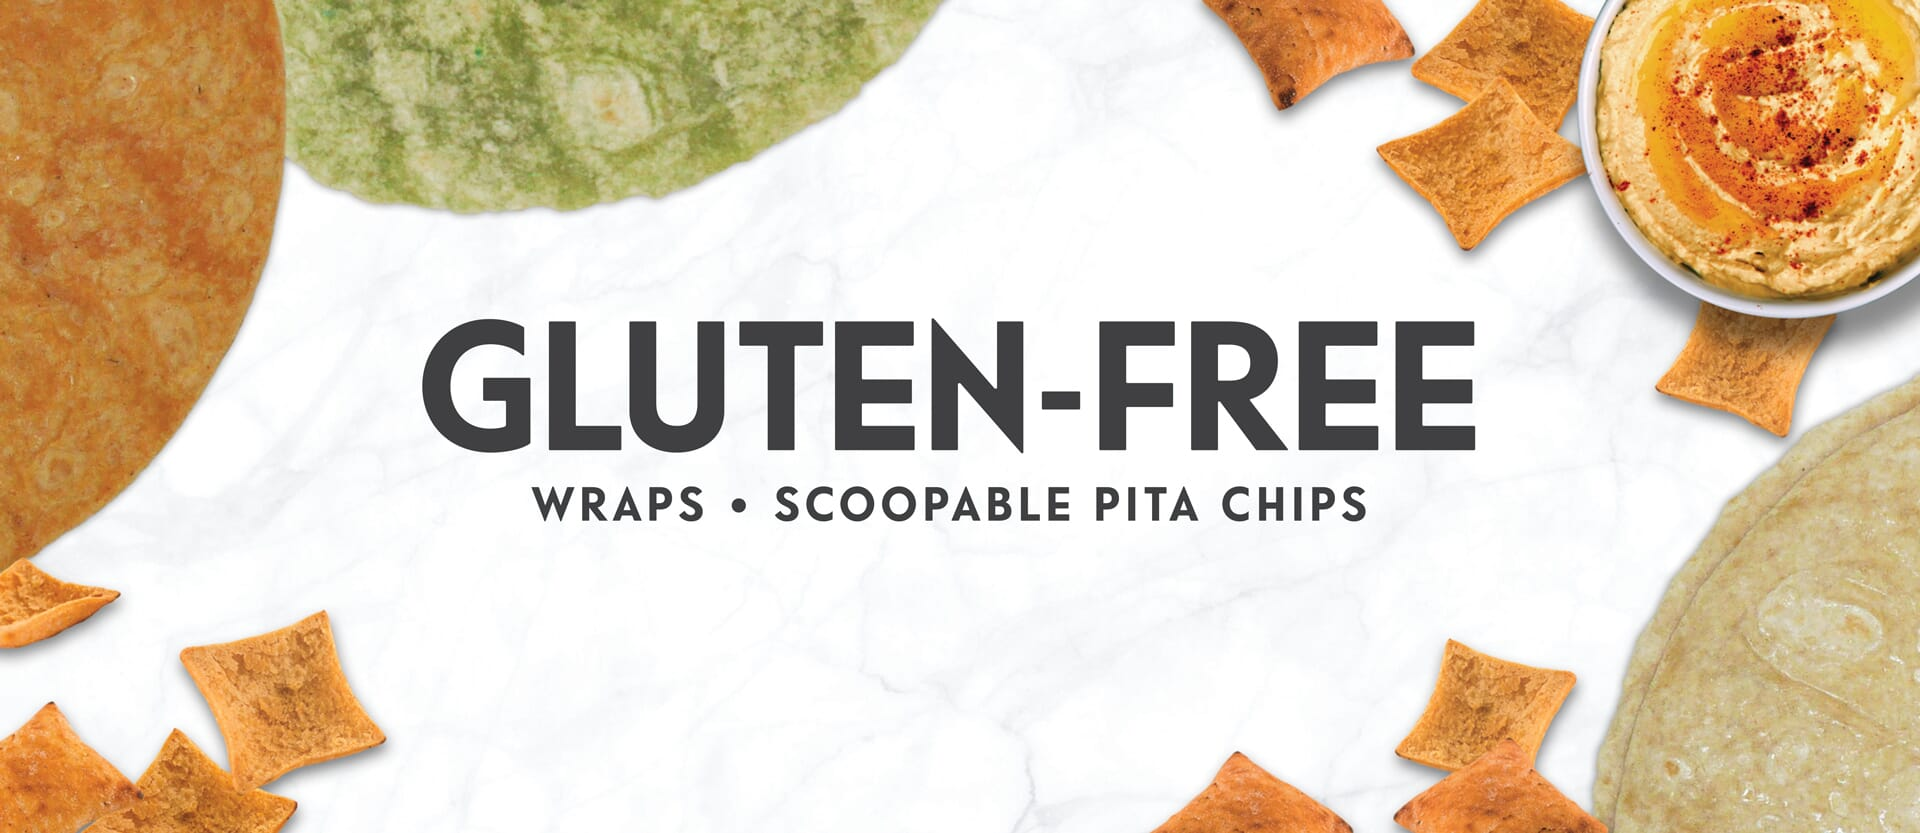 Toufayan Gluten-Free Products